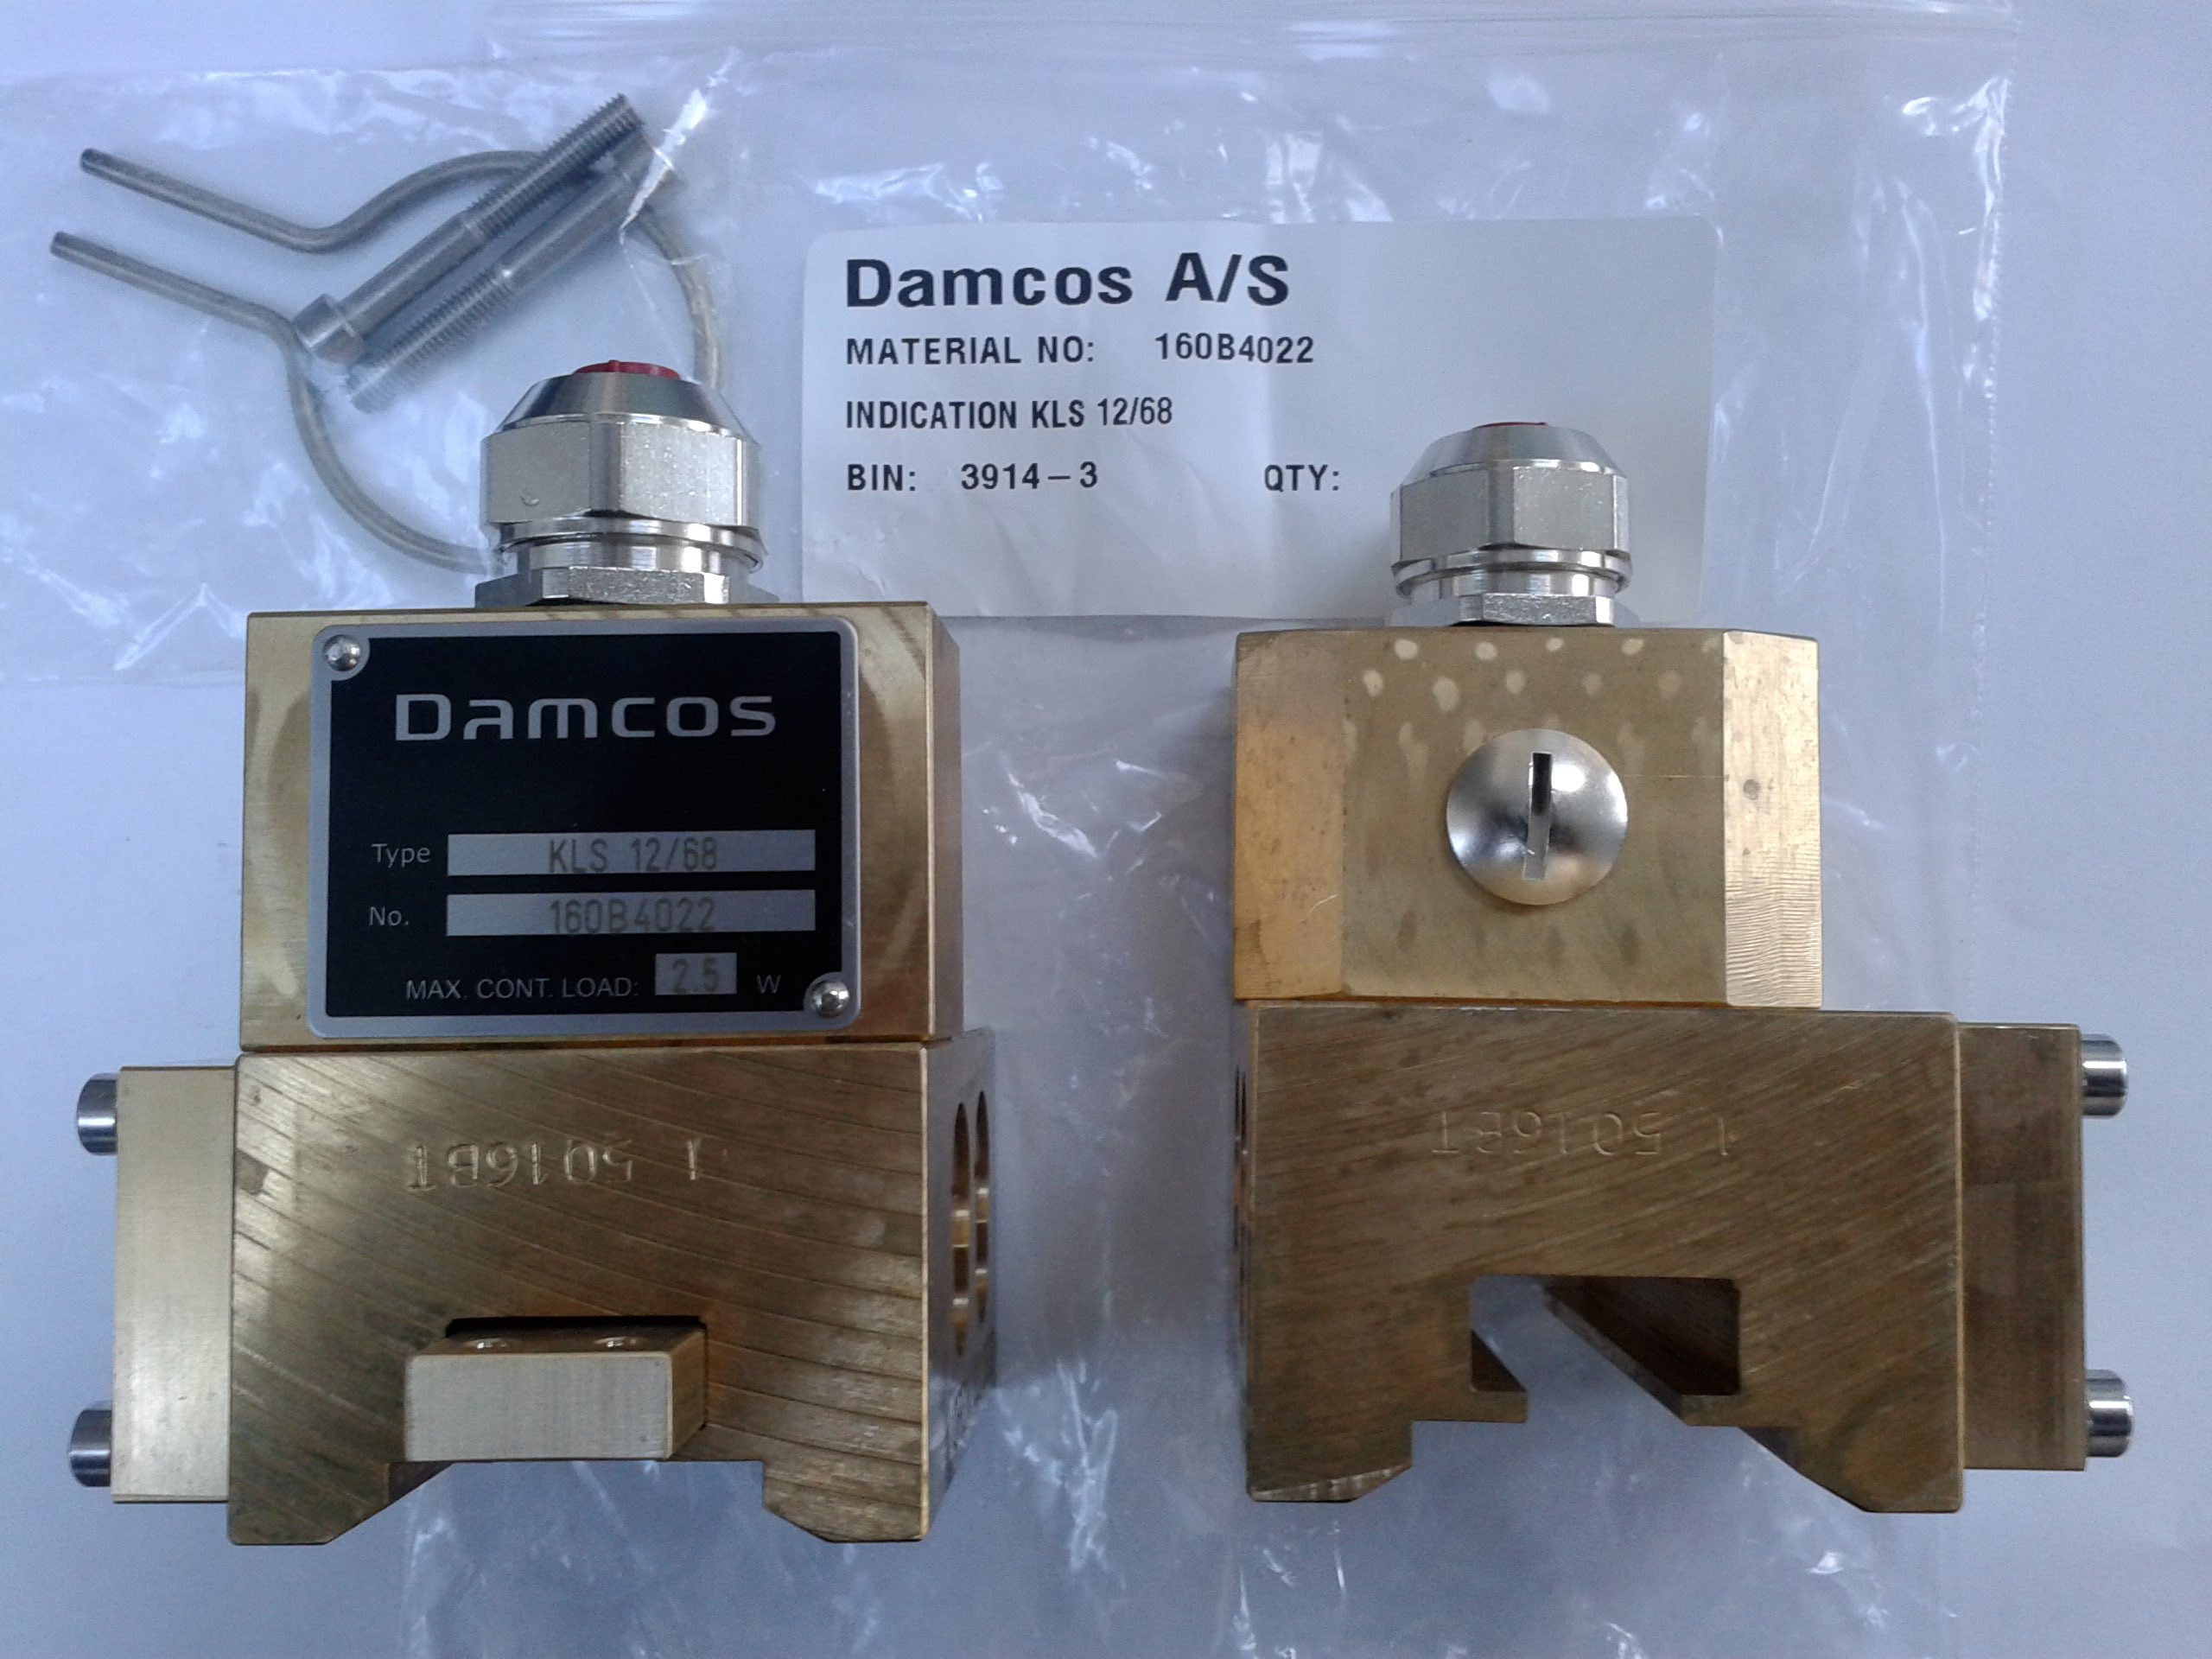 Damcos-Danfoss-KLS-1268-Position-Indicator-160B4022-Image